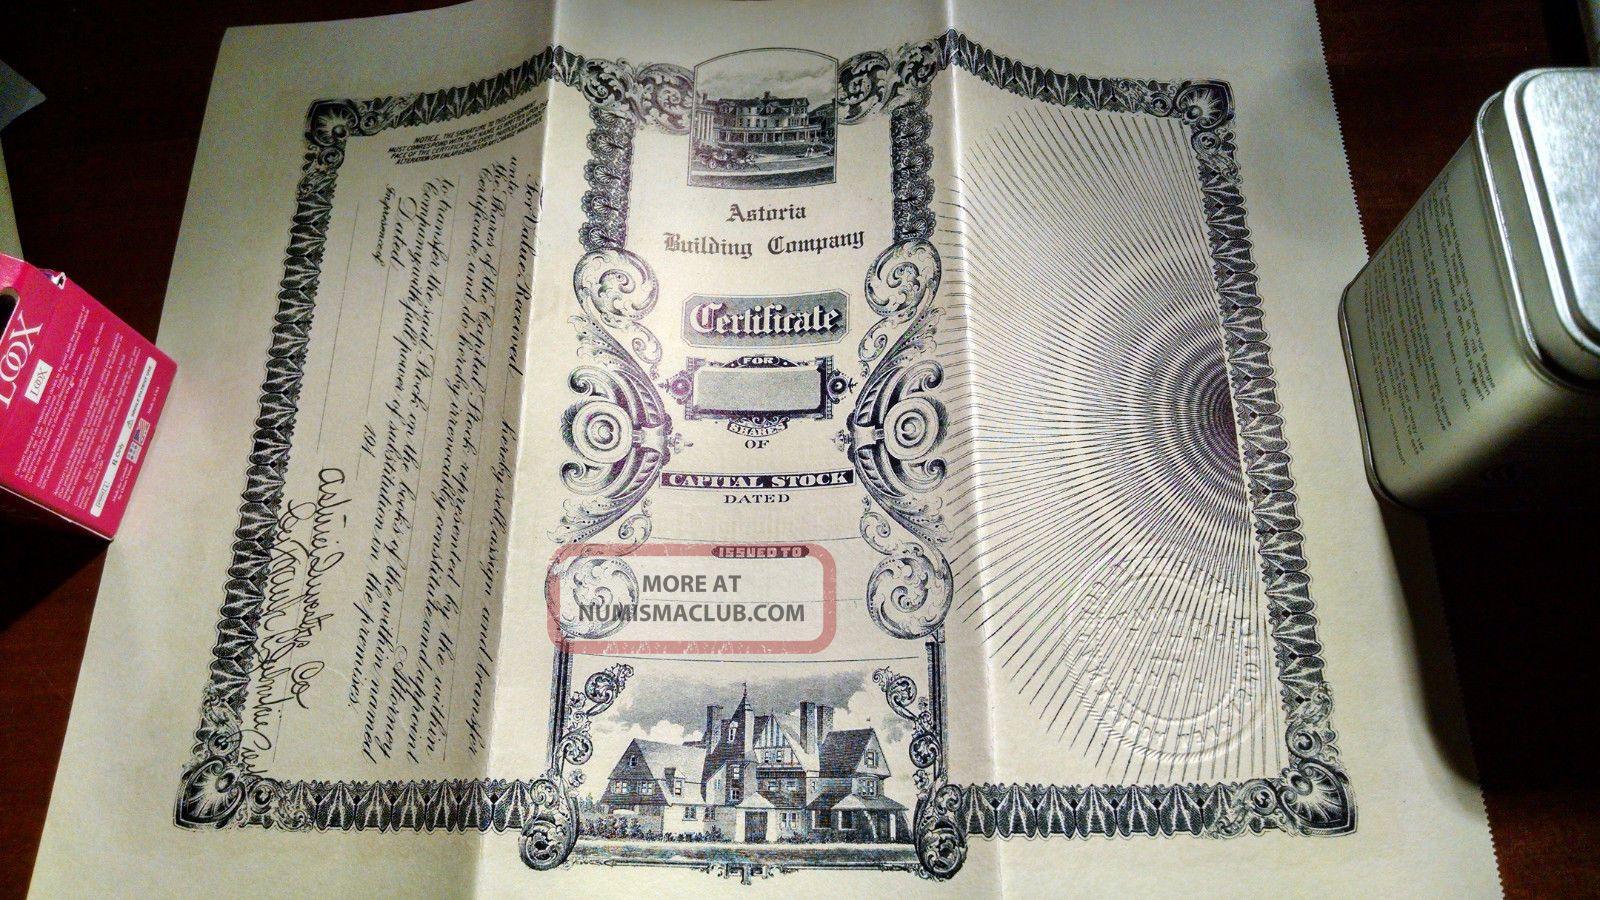 Antique Stock Certificate Signed Nov 1911 Astoria Building Corp $10,  000 Face Val Stocks & Bonds, Scripophily photo